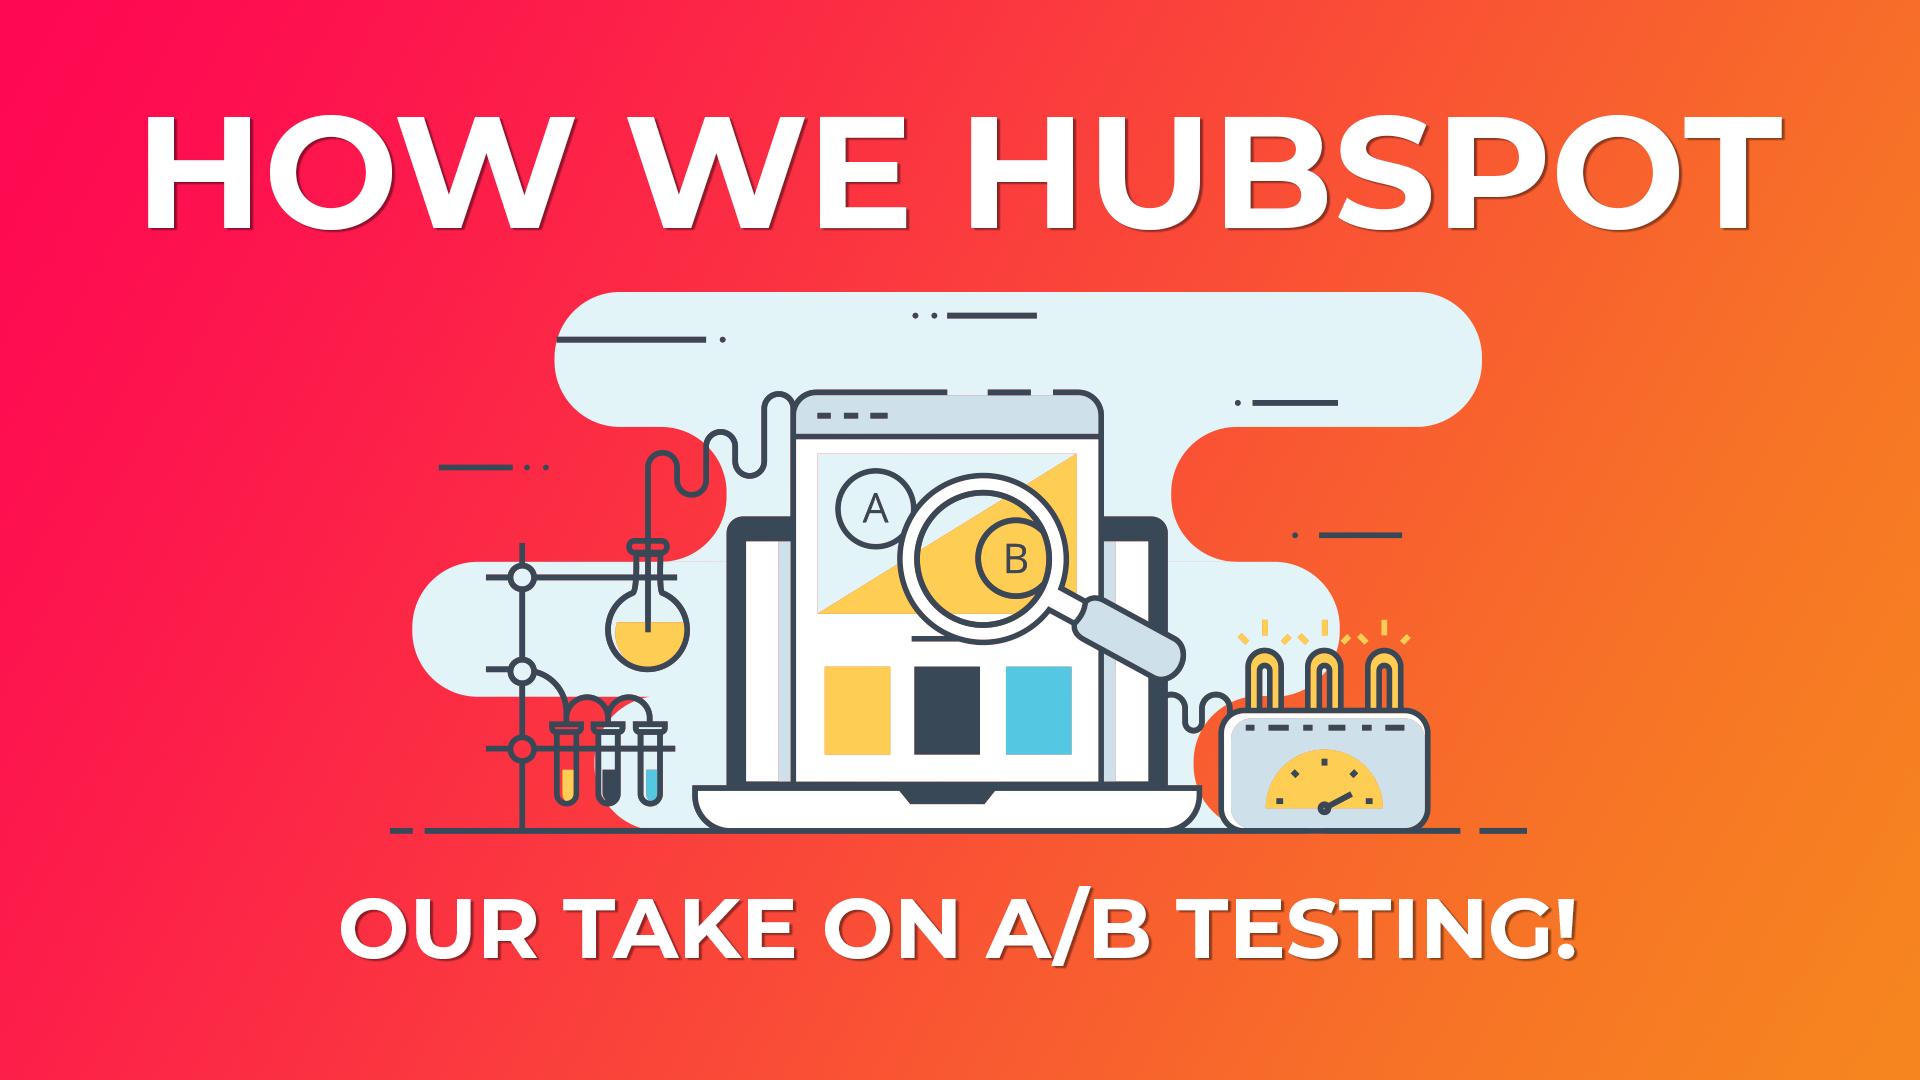 How We HubSpot A-B Testing